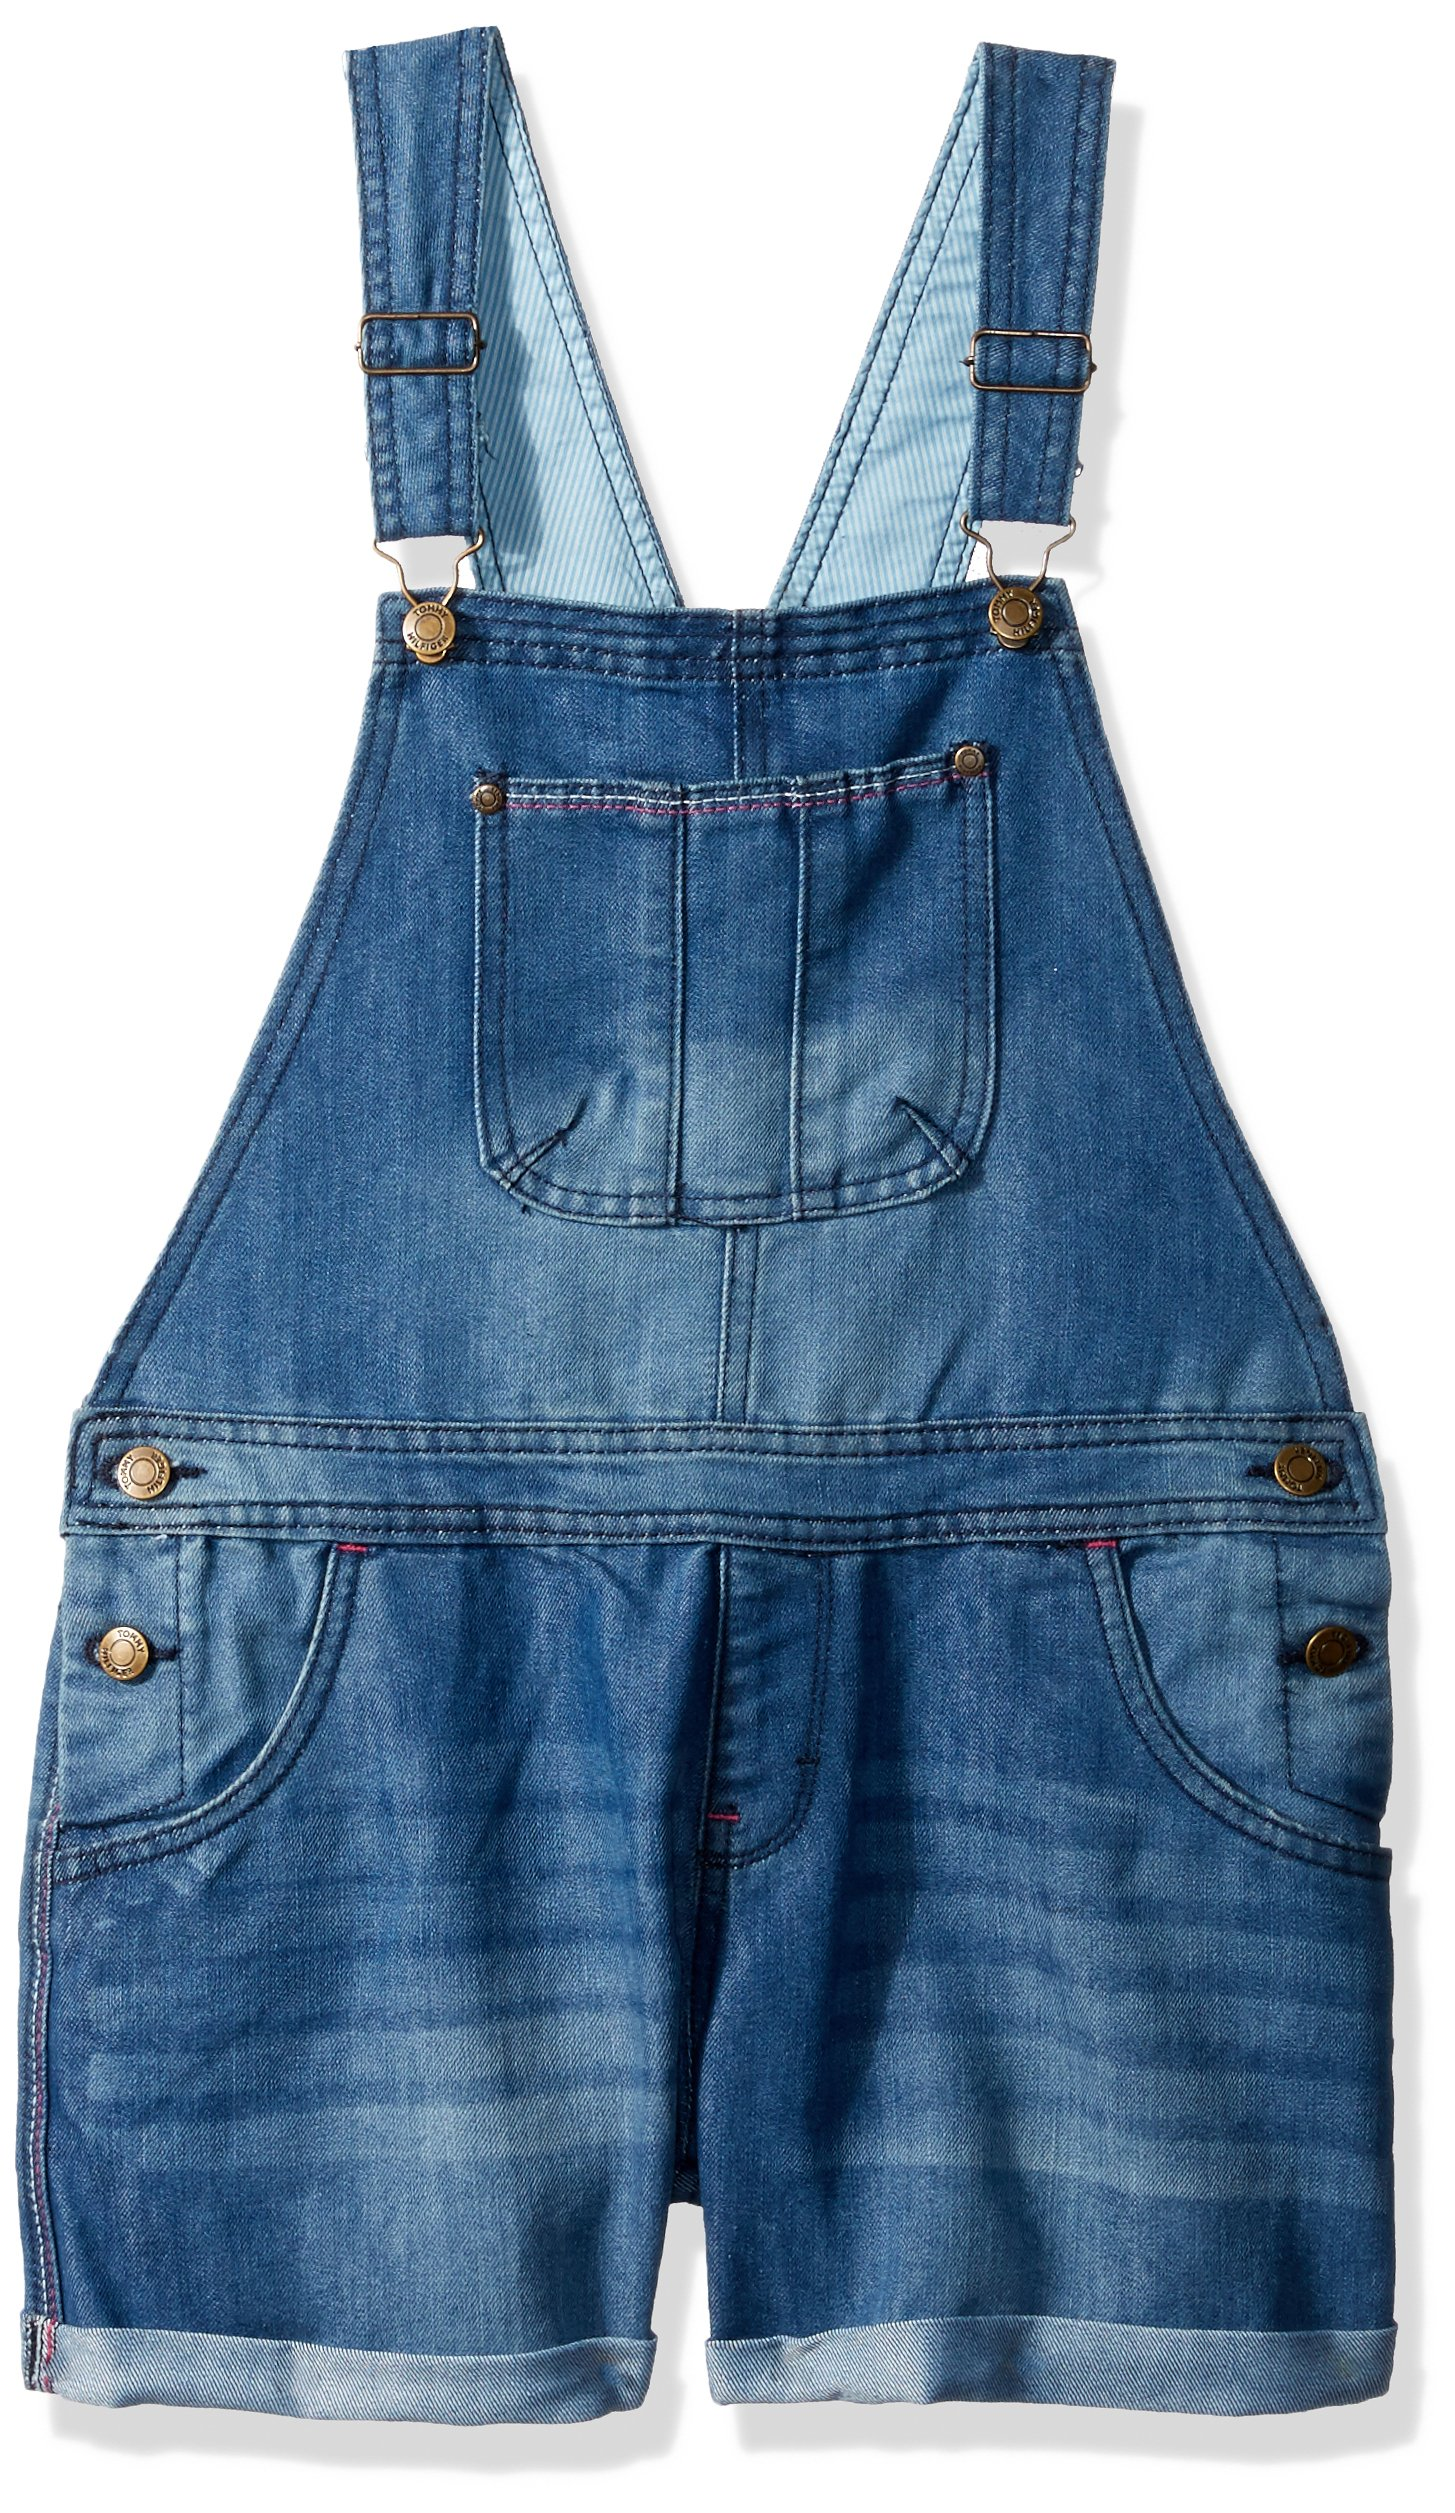 Tommy Hilfiger Big Girls' Denim Shortall, Parisian Blue, Large